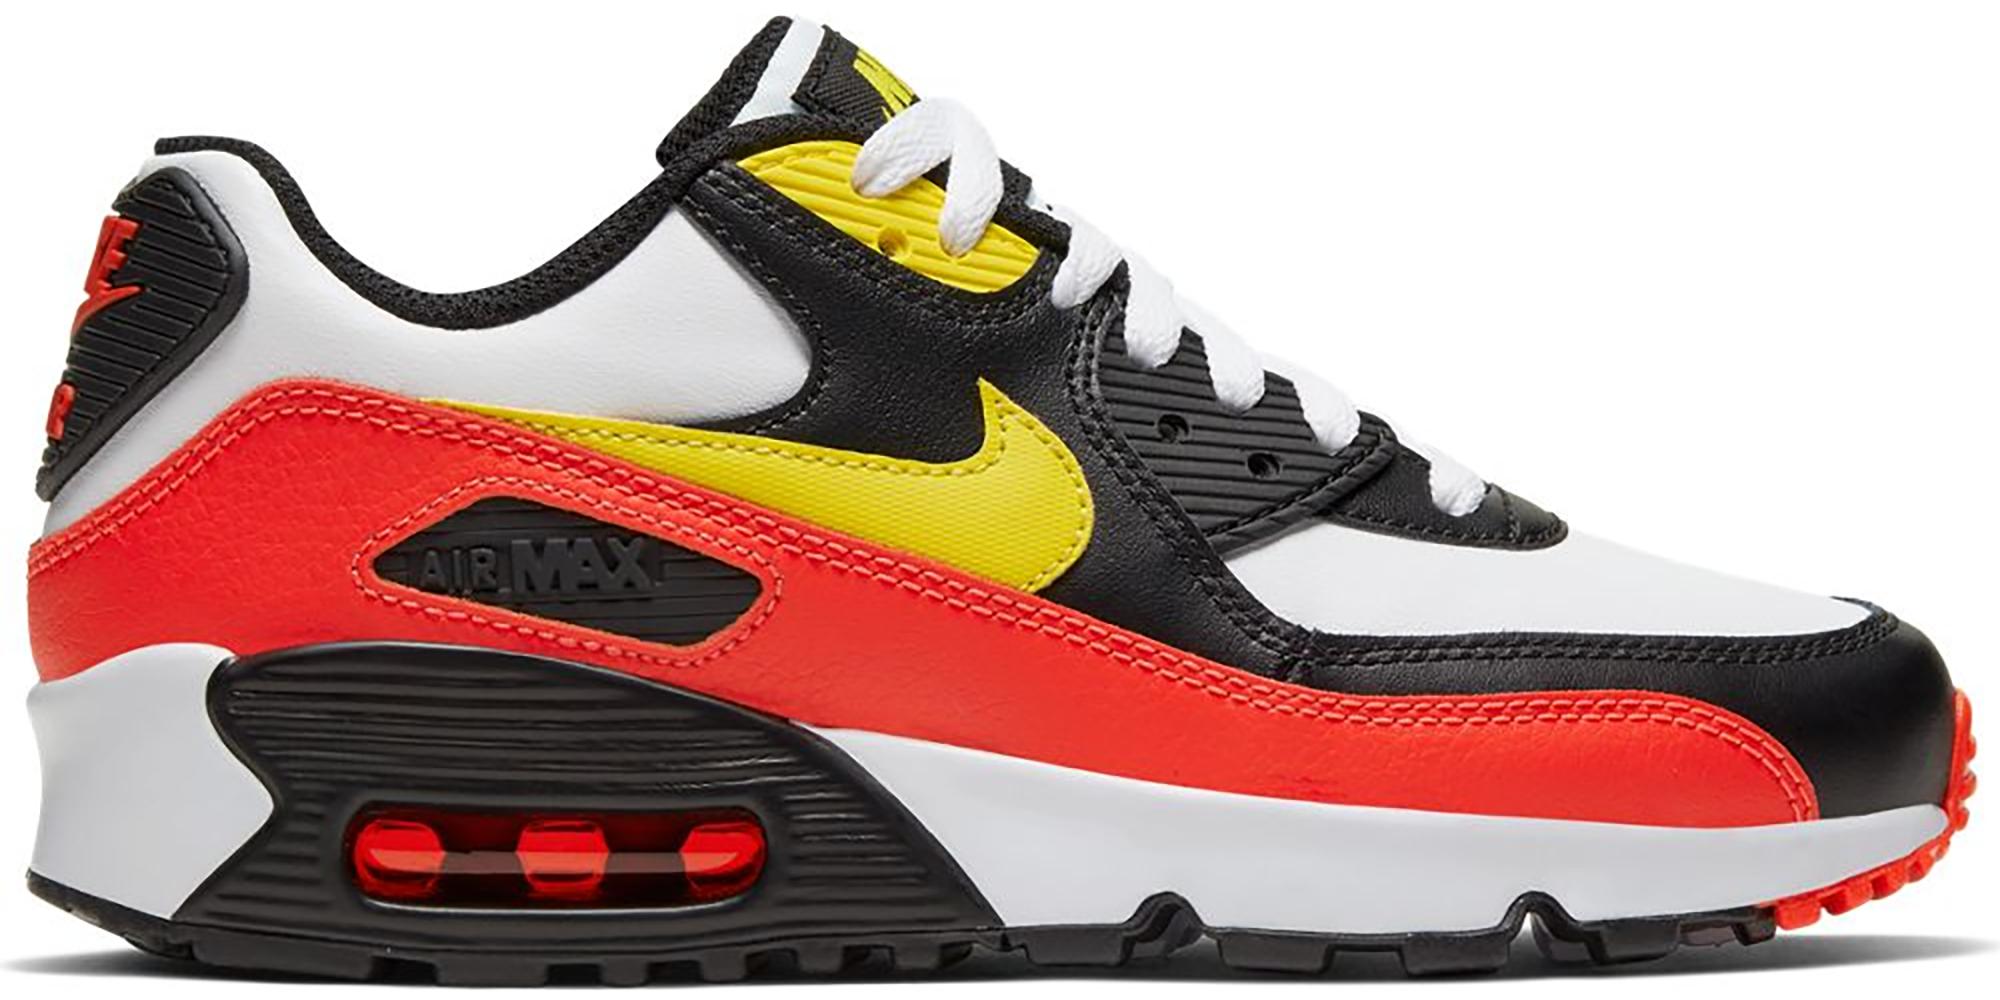 Nike Air Max 90 White Yellow Black